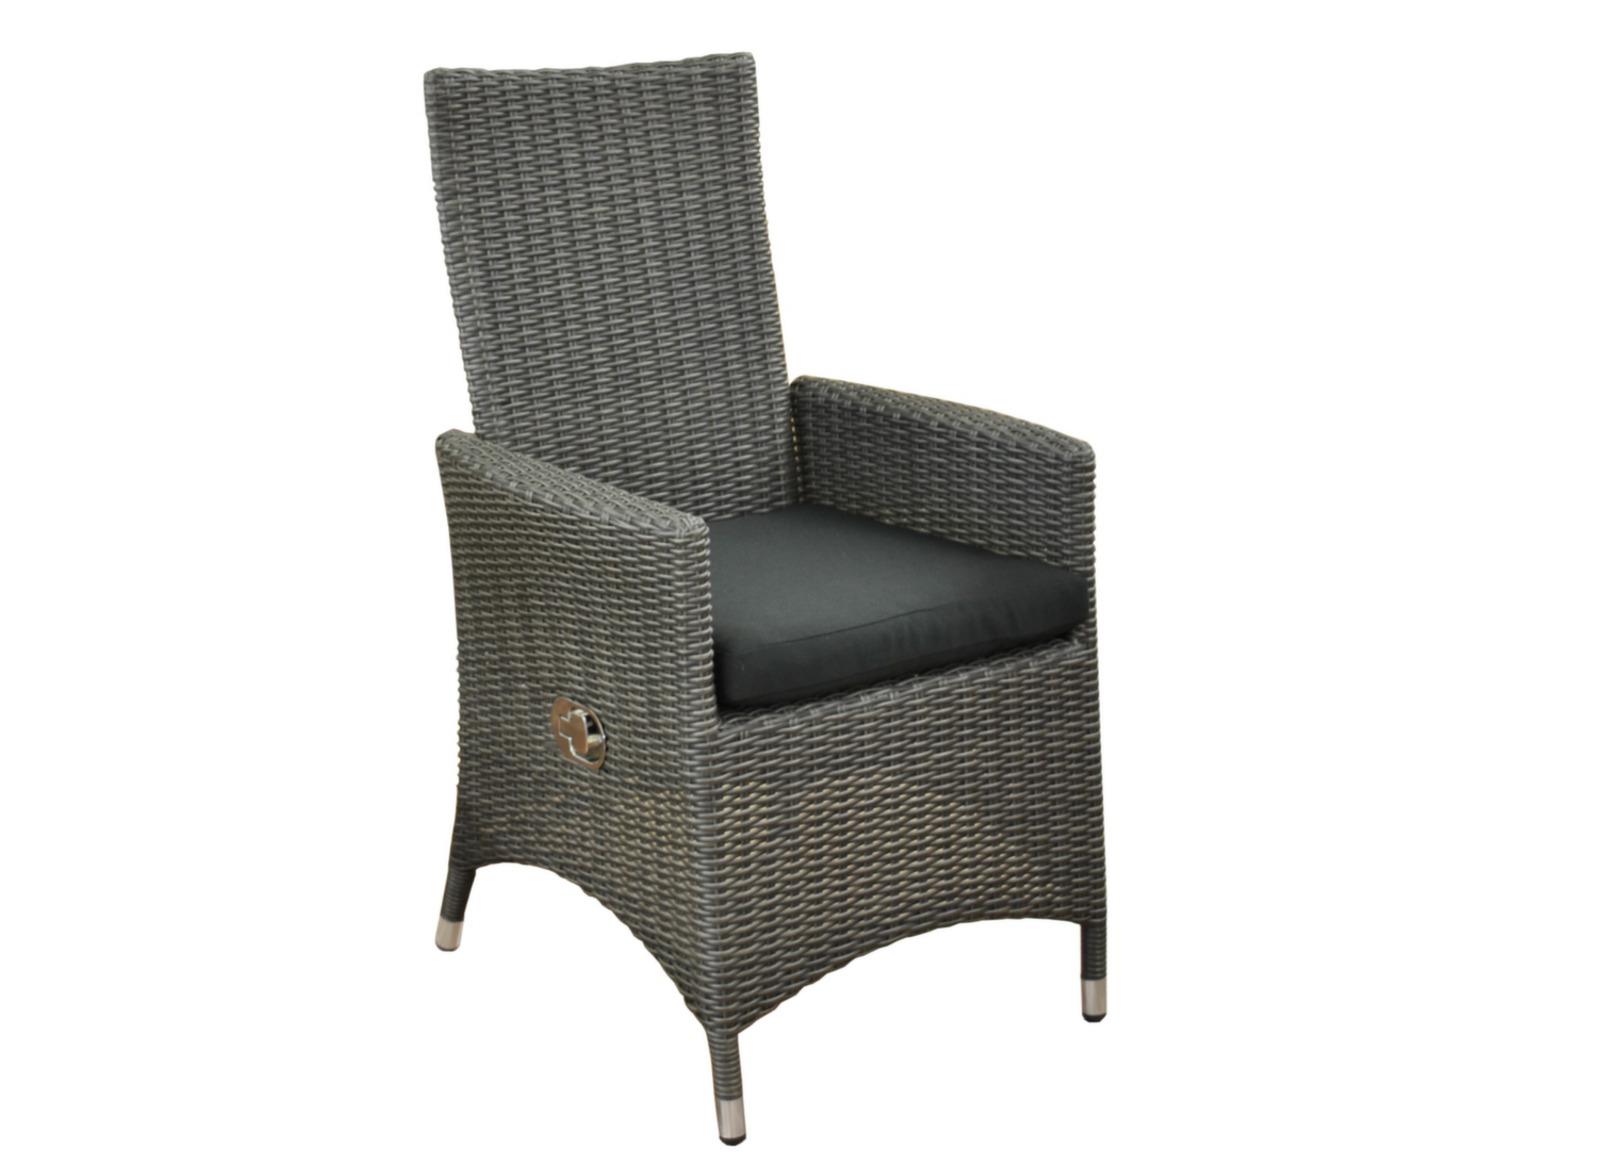 Fauteuil portland pump mystic grey fauteuils de jardin mobilier pour salo - Fauteuil detente jardin ...